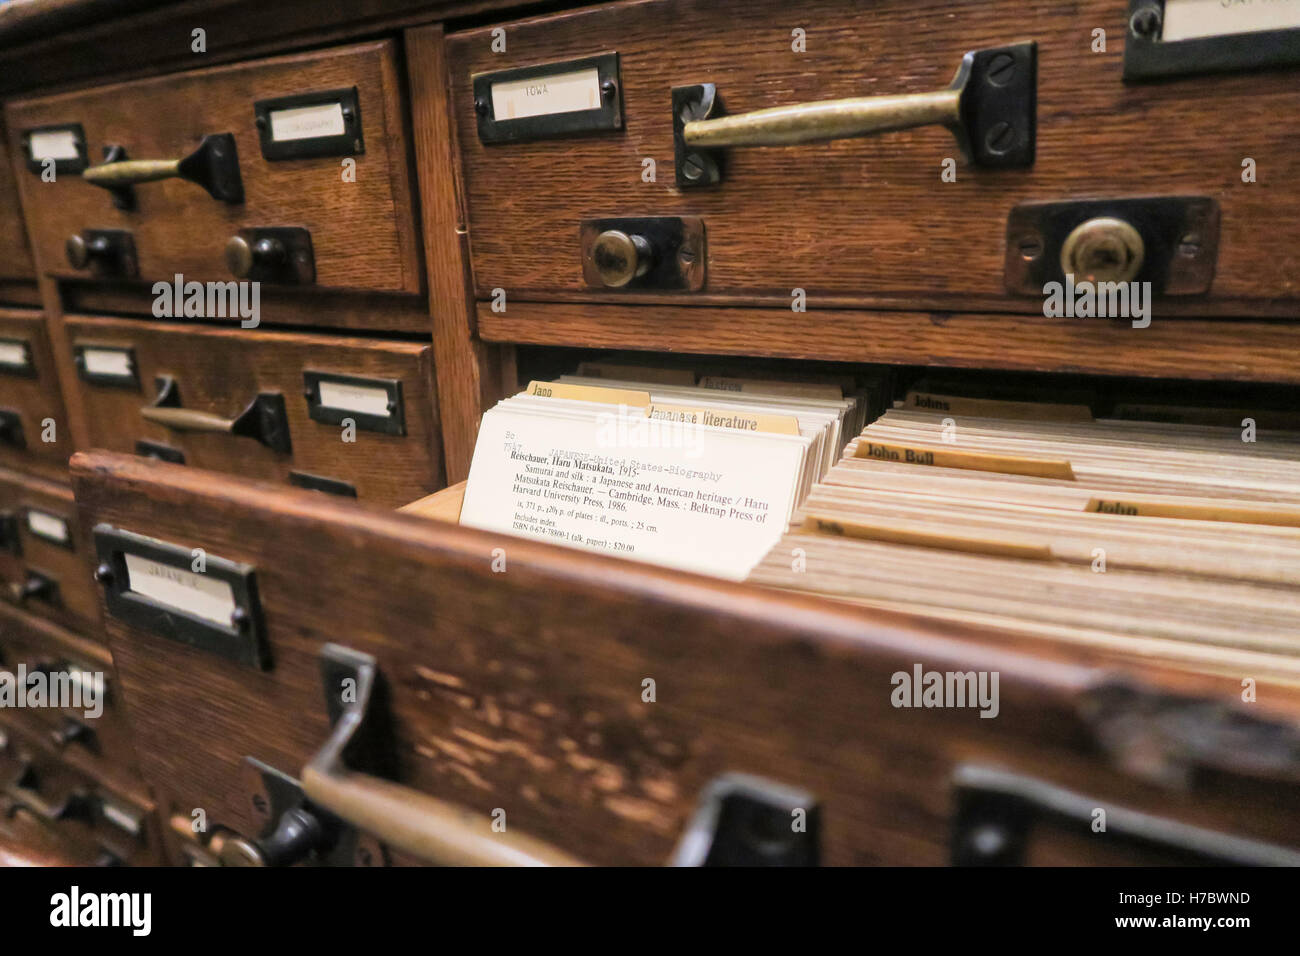 Biblioteca Catalogo carta, STATI UNITI D'AMERICA Immagini Stock